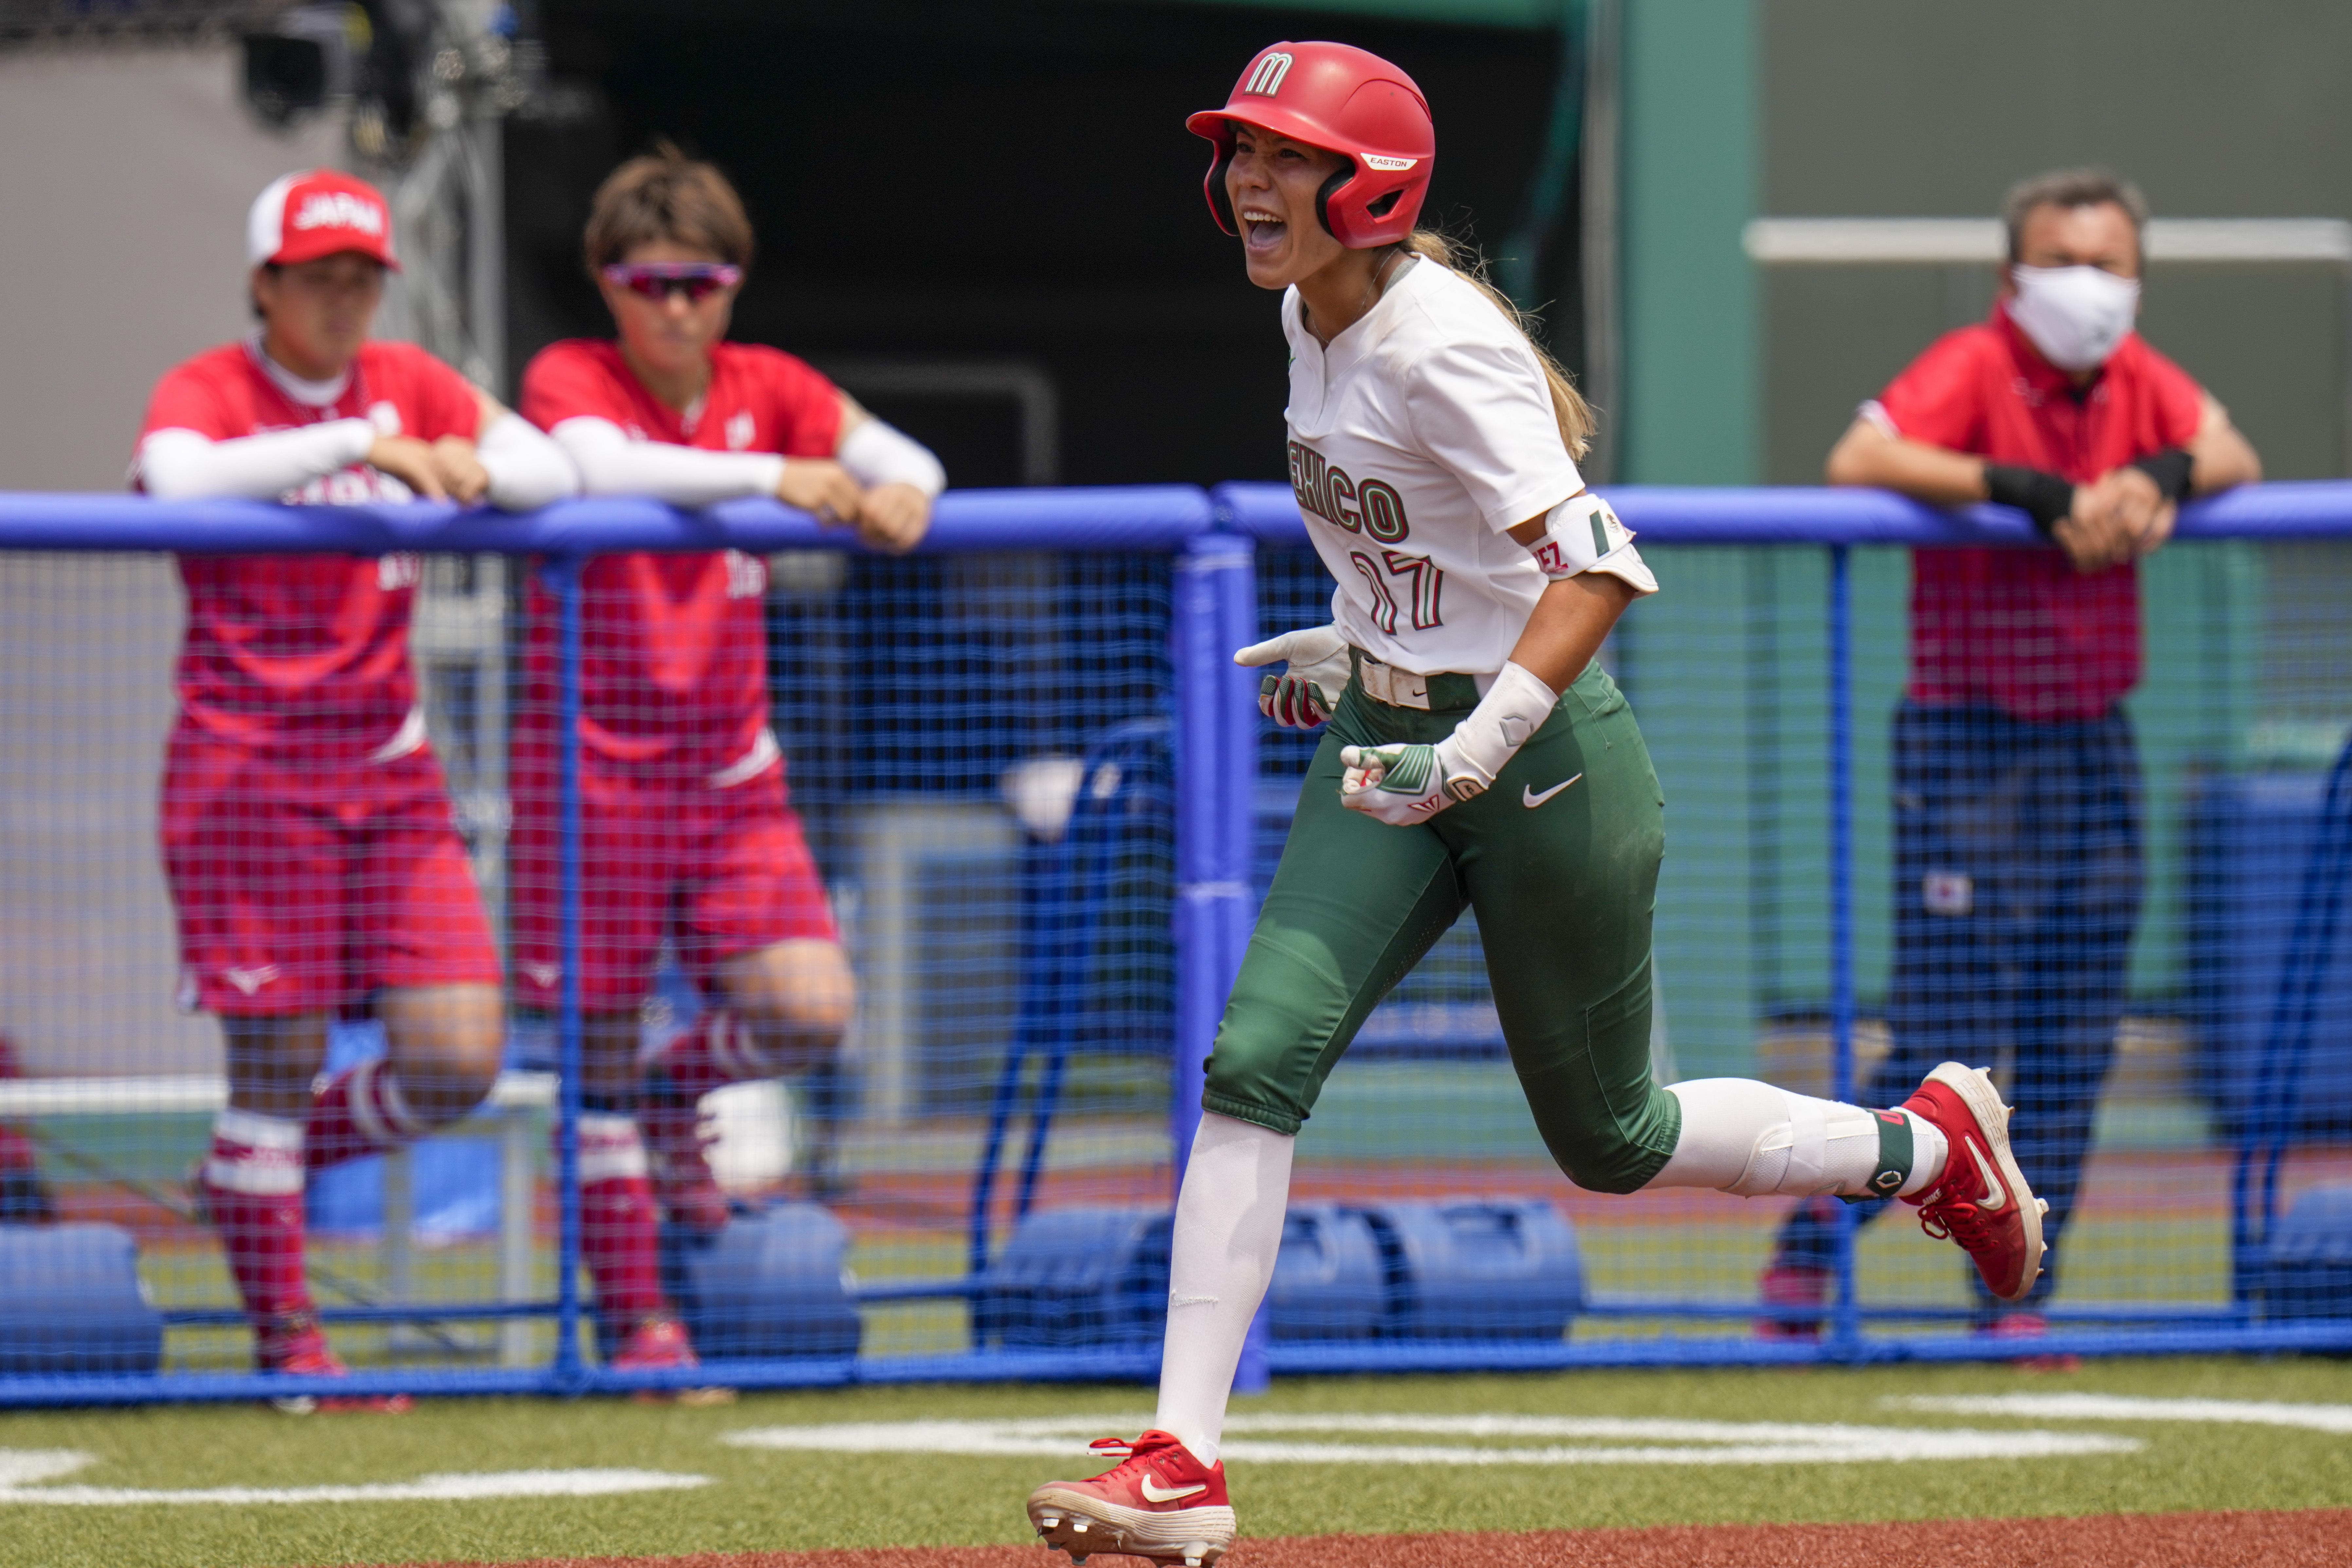 Mexico's Anissa Urtez celebrates as she hits a home run.